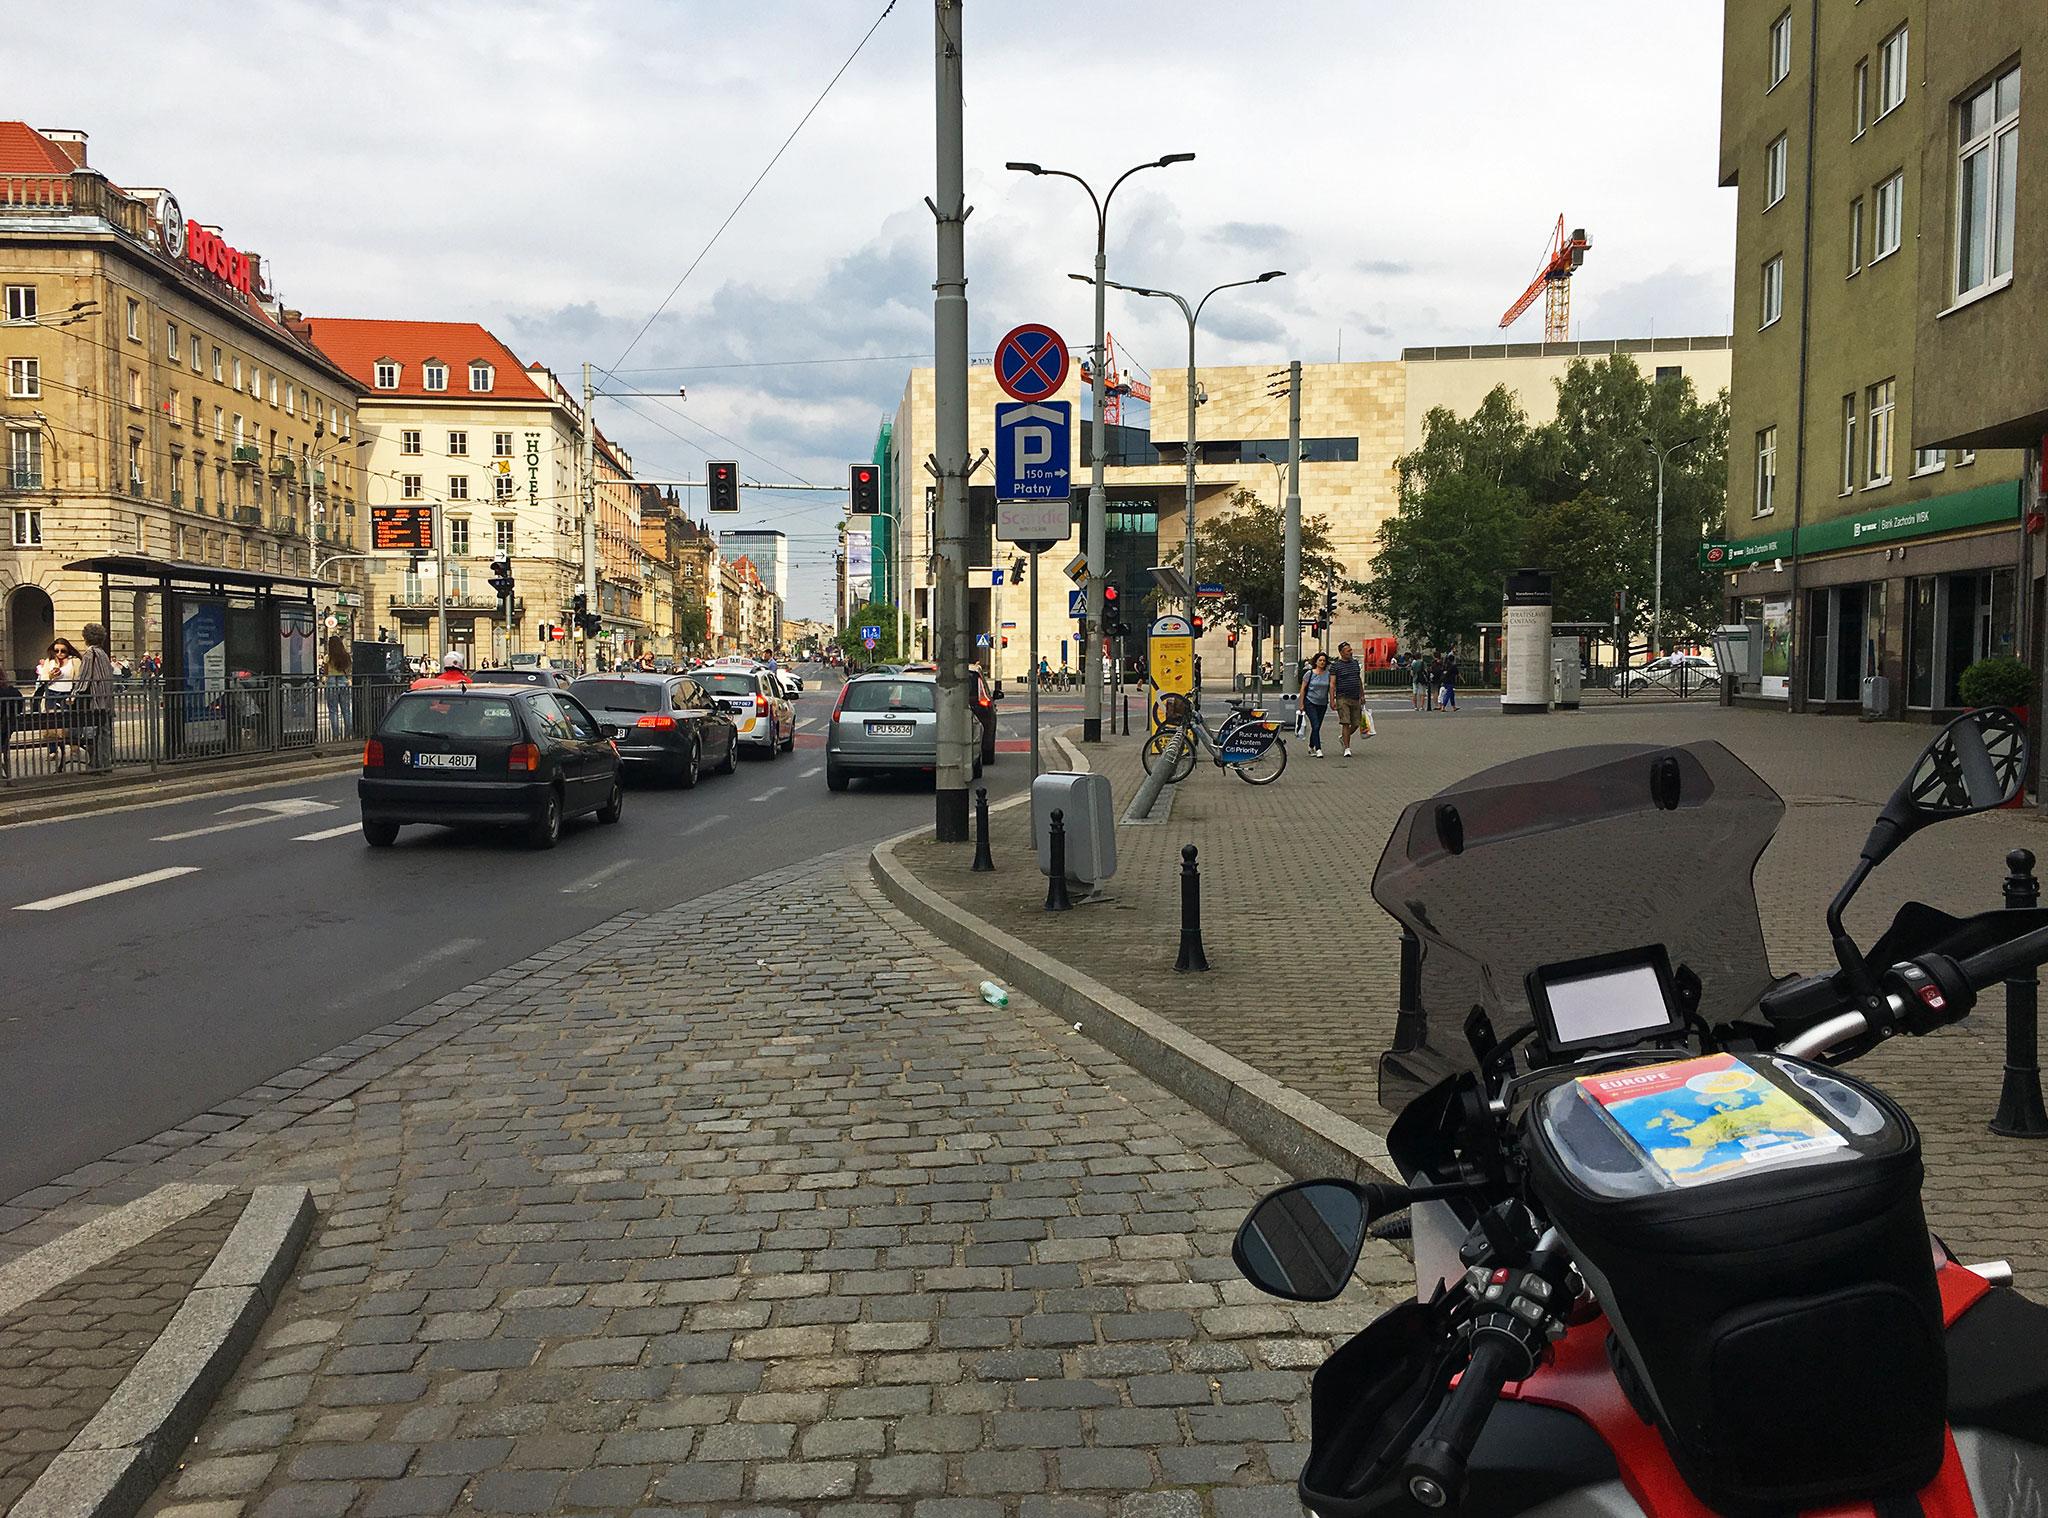 Downtown Wroclaw